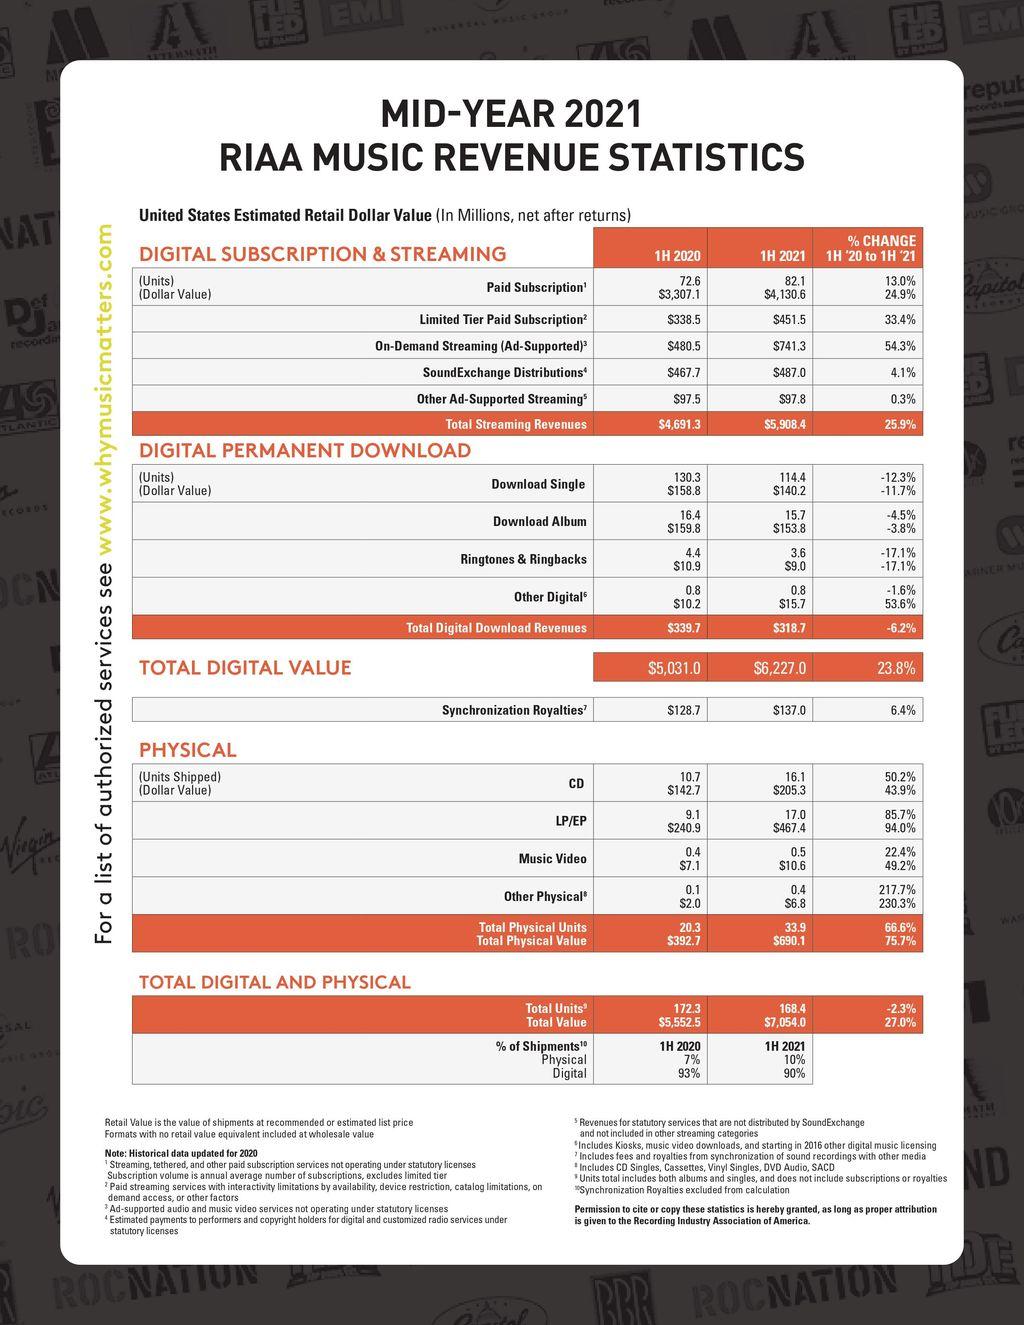 RIAA年中报告:上半年美国音乐类营收71亿美元 同比增长27%